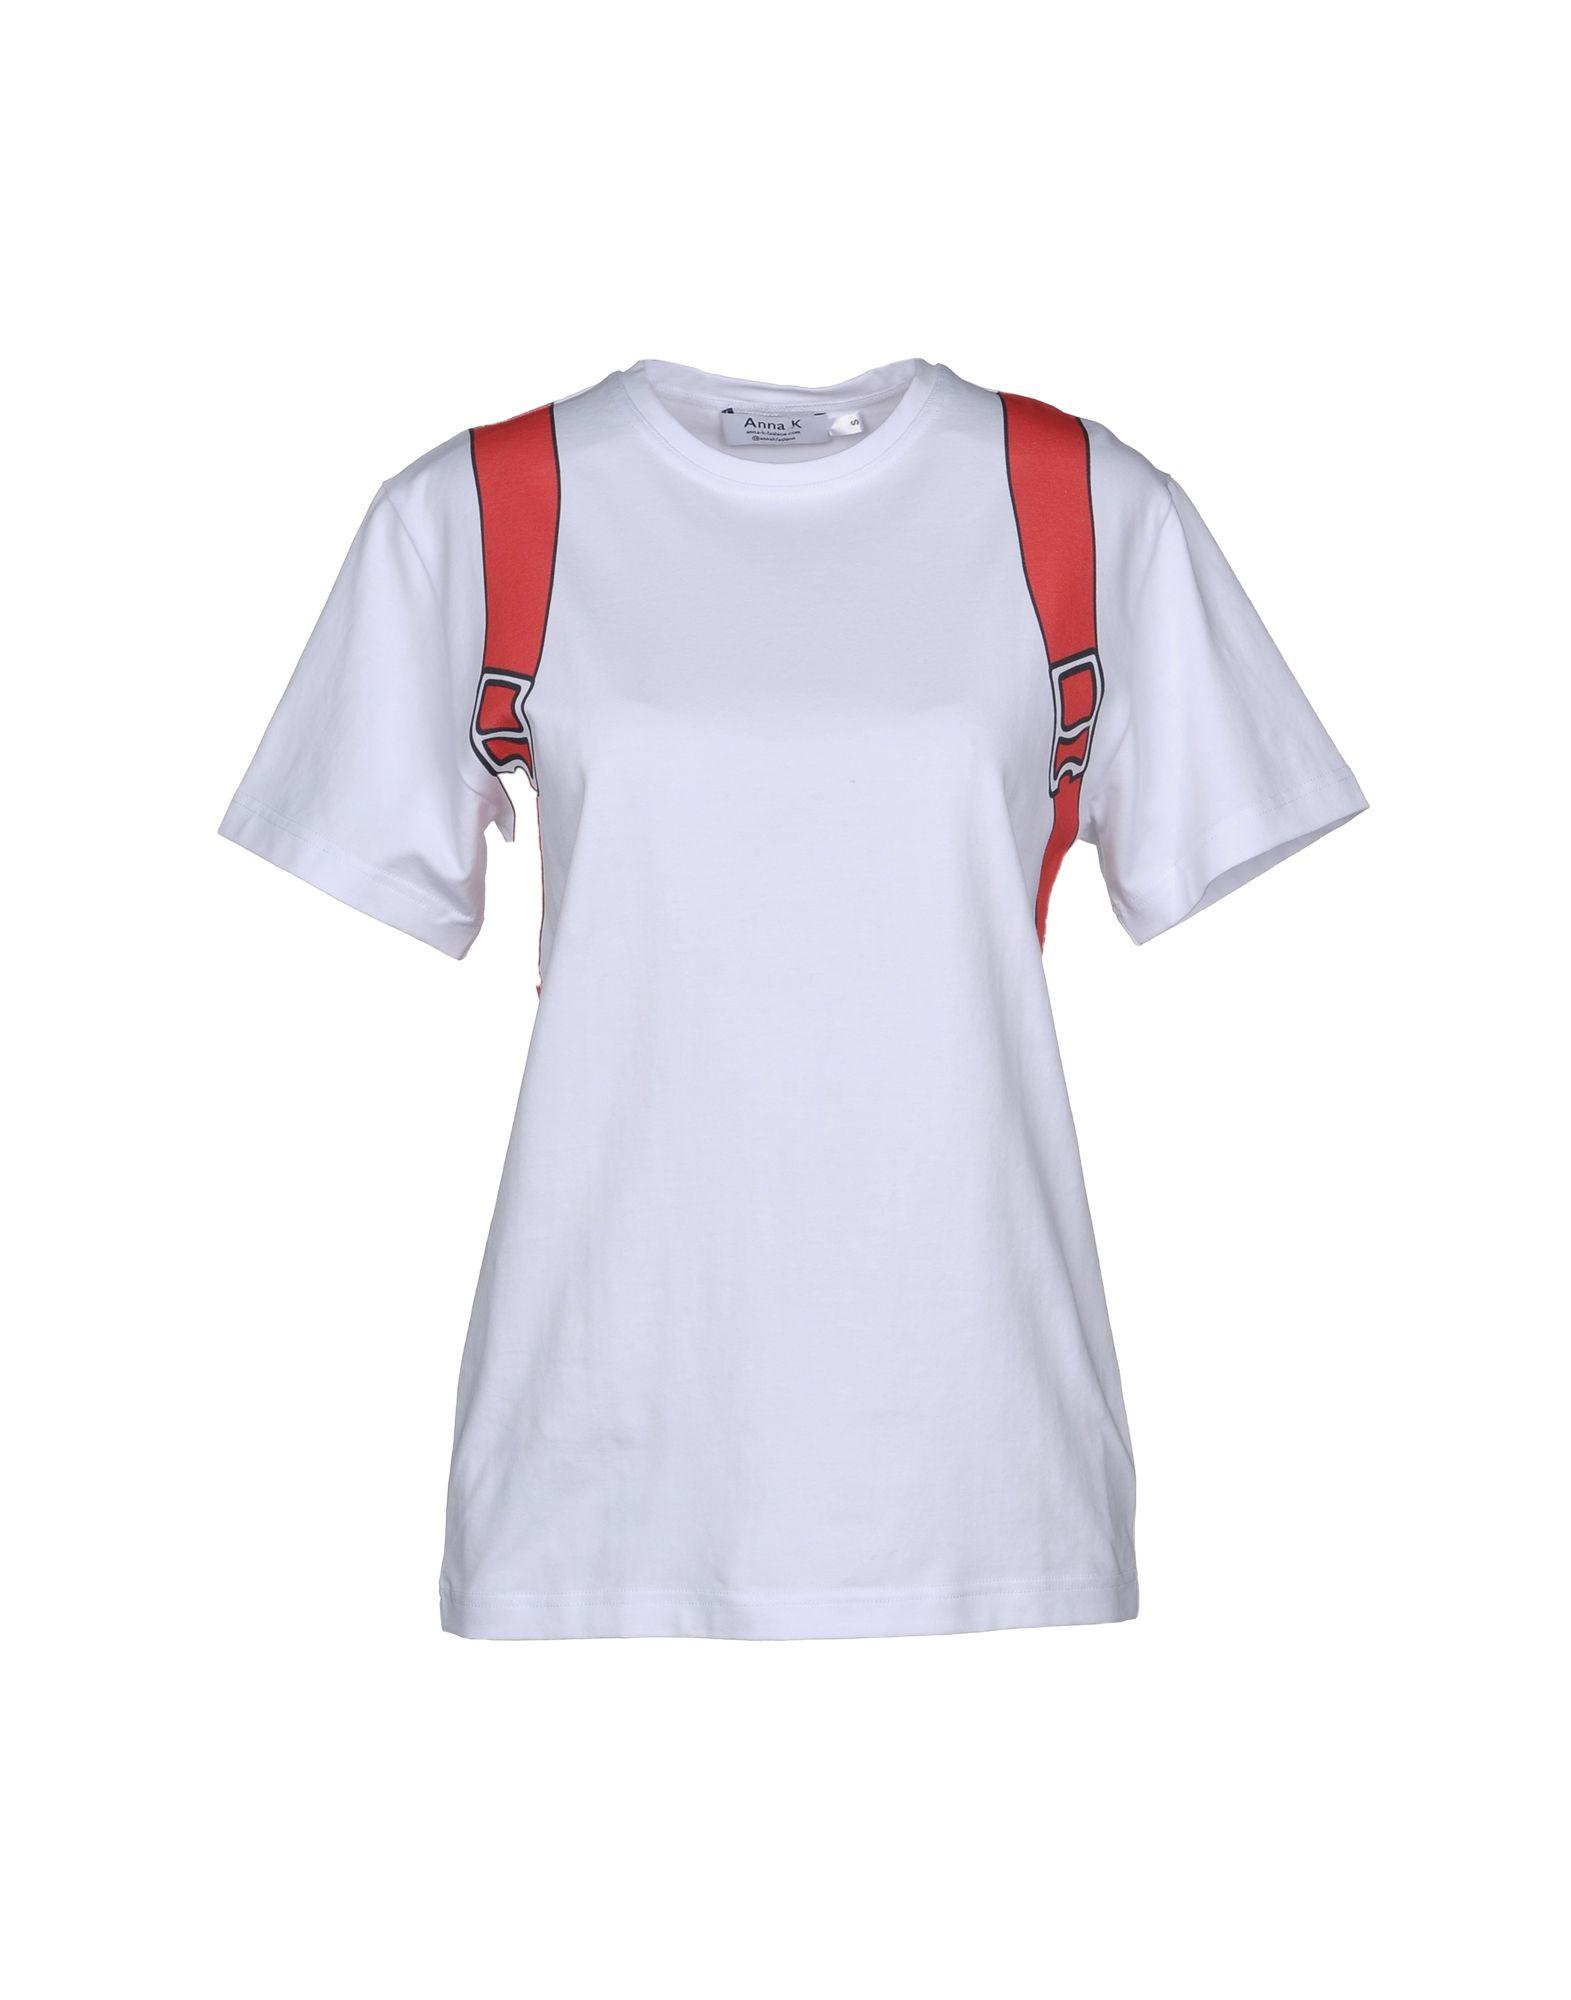 ANNAK T-Shirt in White